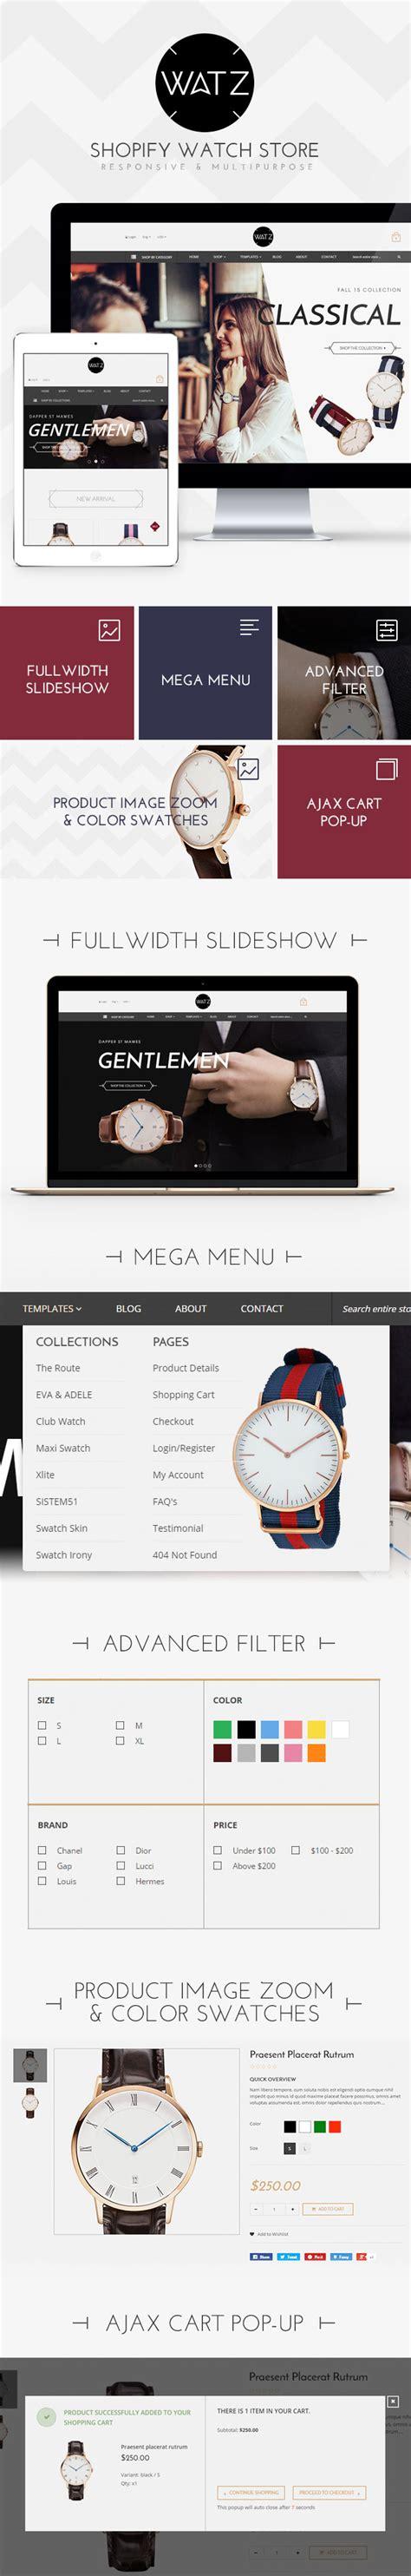 shopify upgrade theme watch store responsive shopify theme watz ecommerce